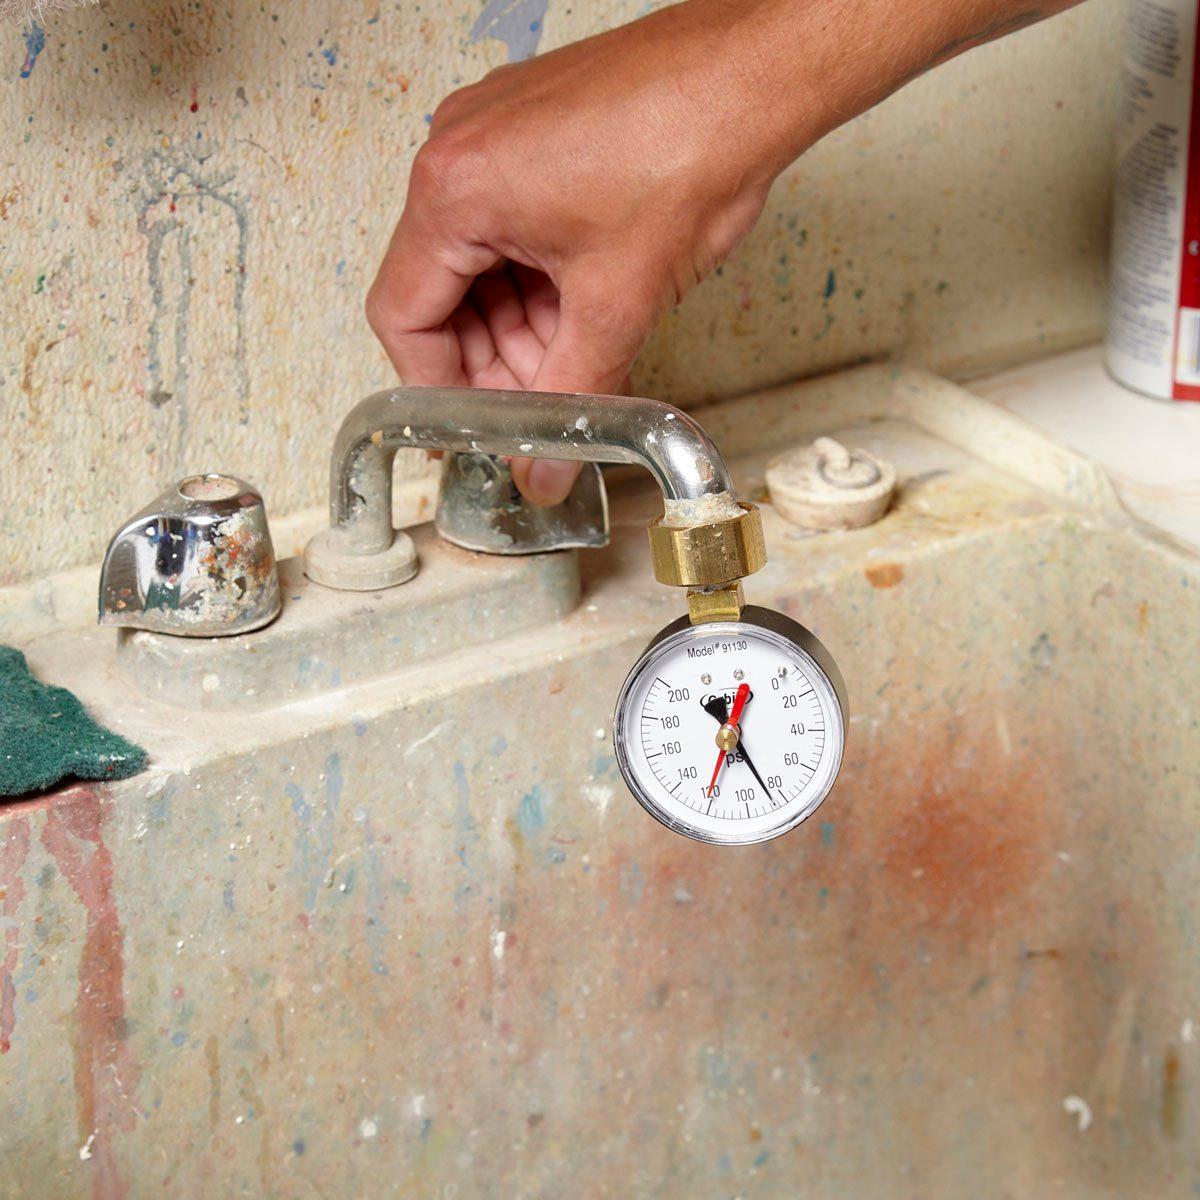 high water pressure